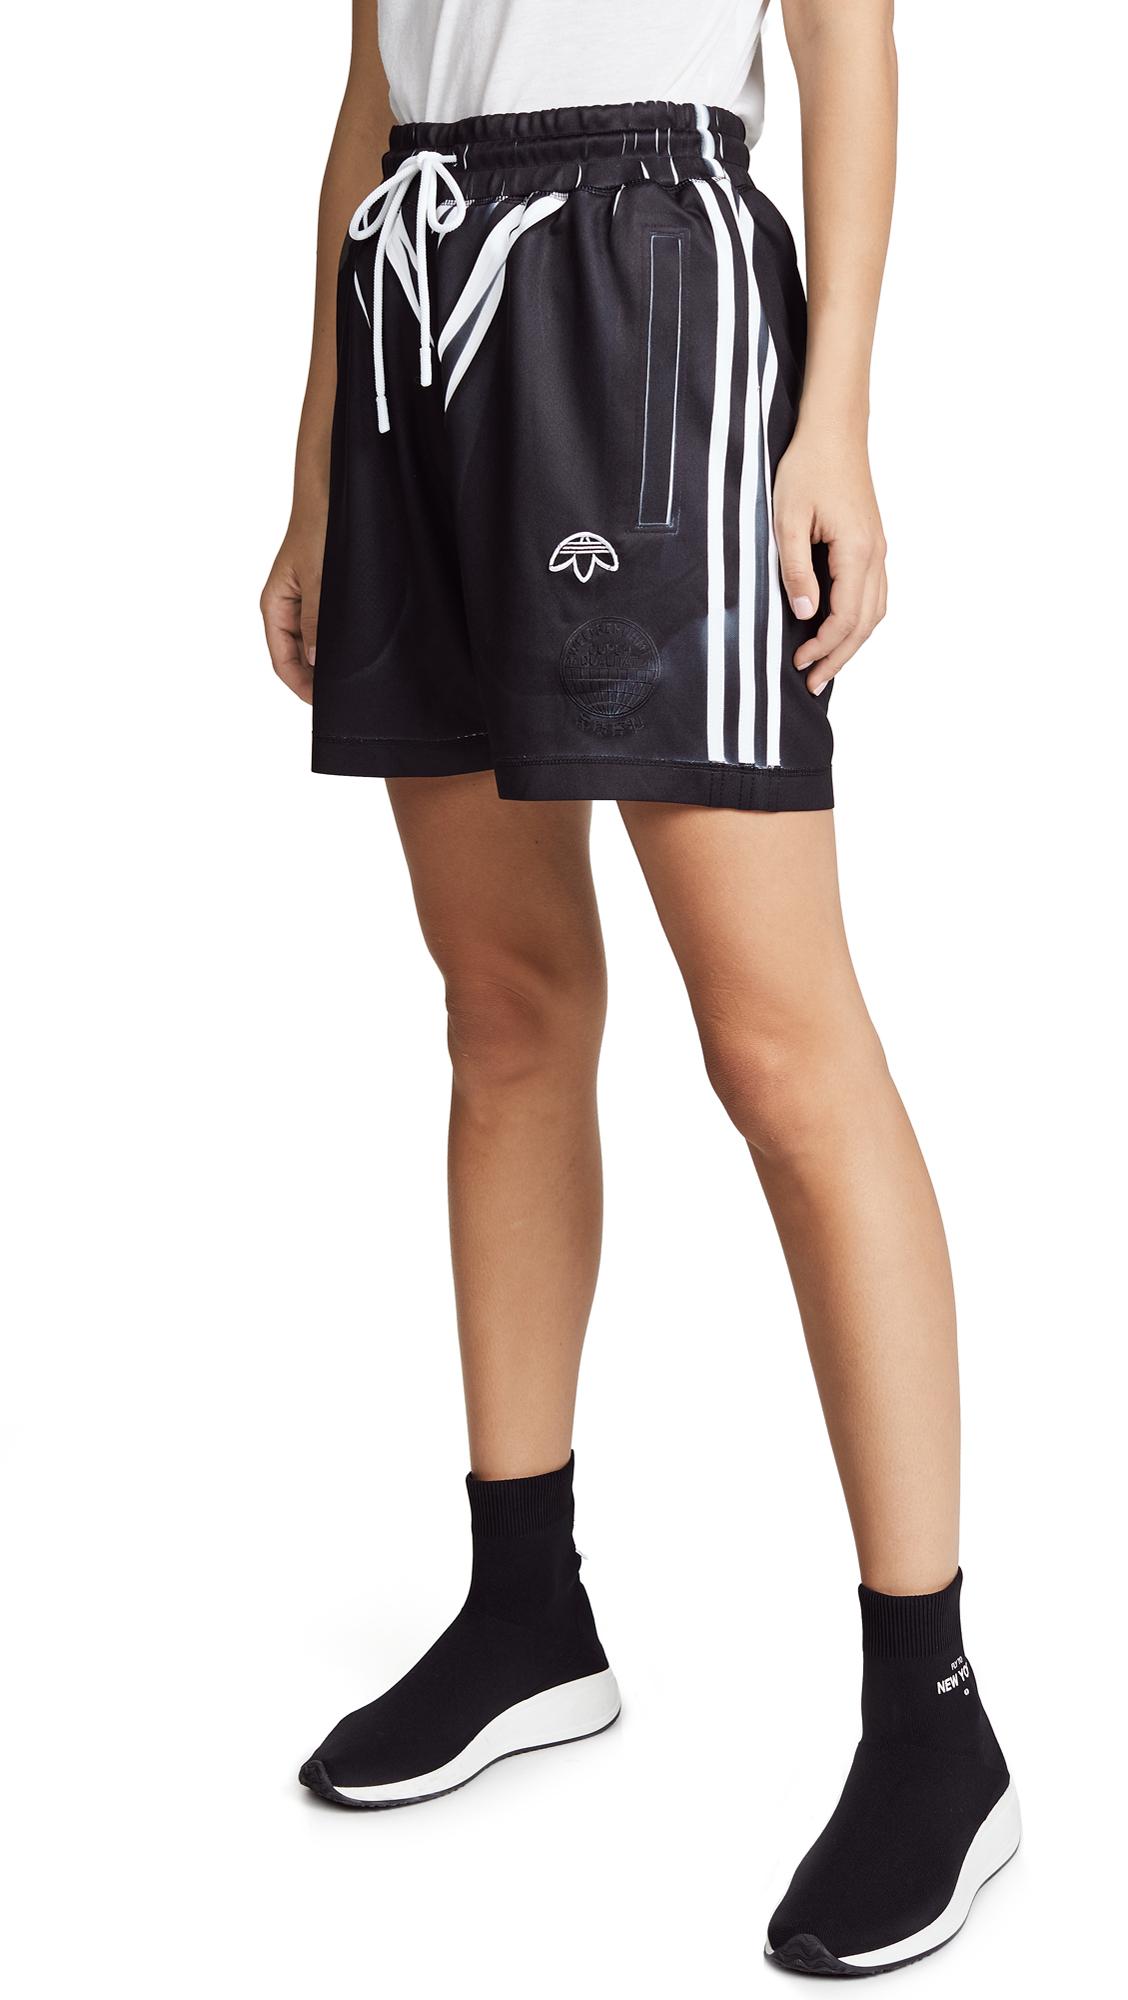 da5bb63ea400 adidas Originals by Alexander Wang AW Shorts